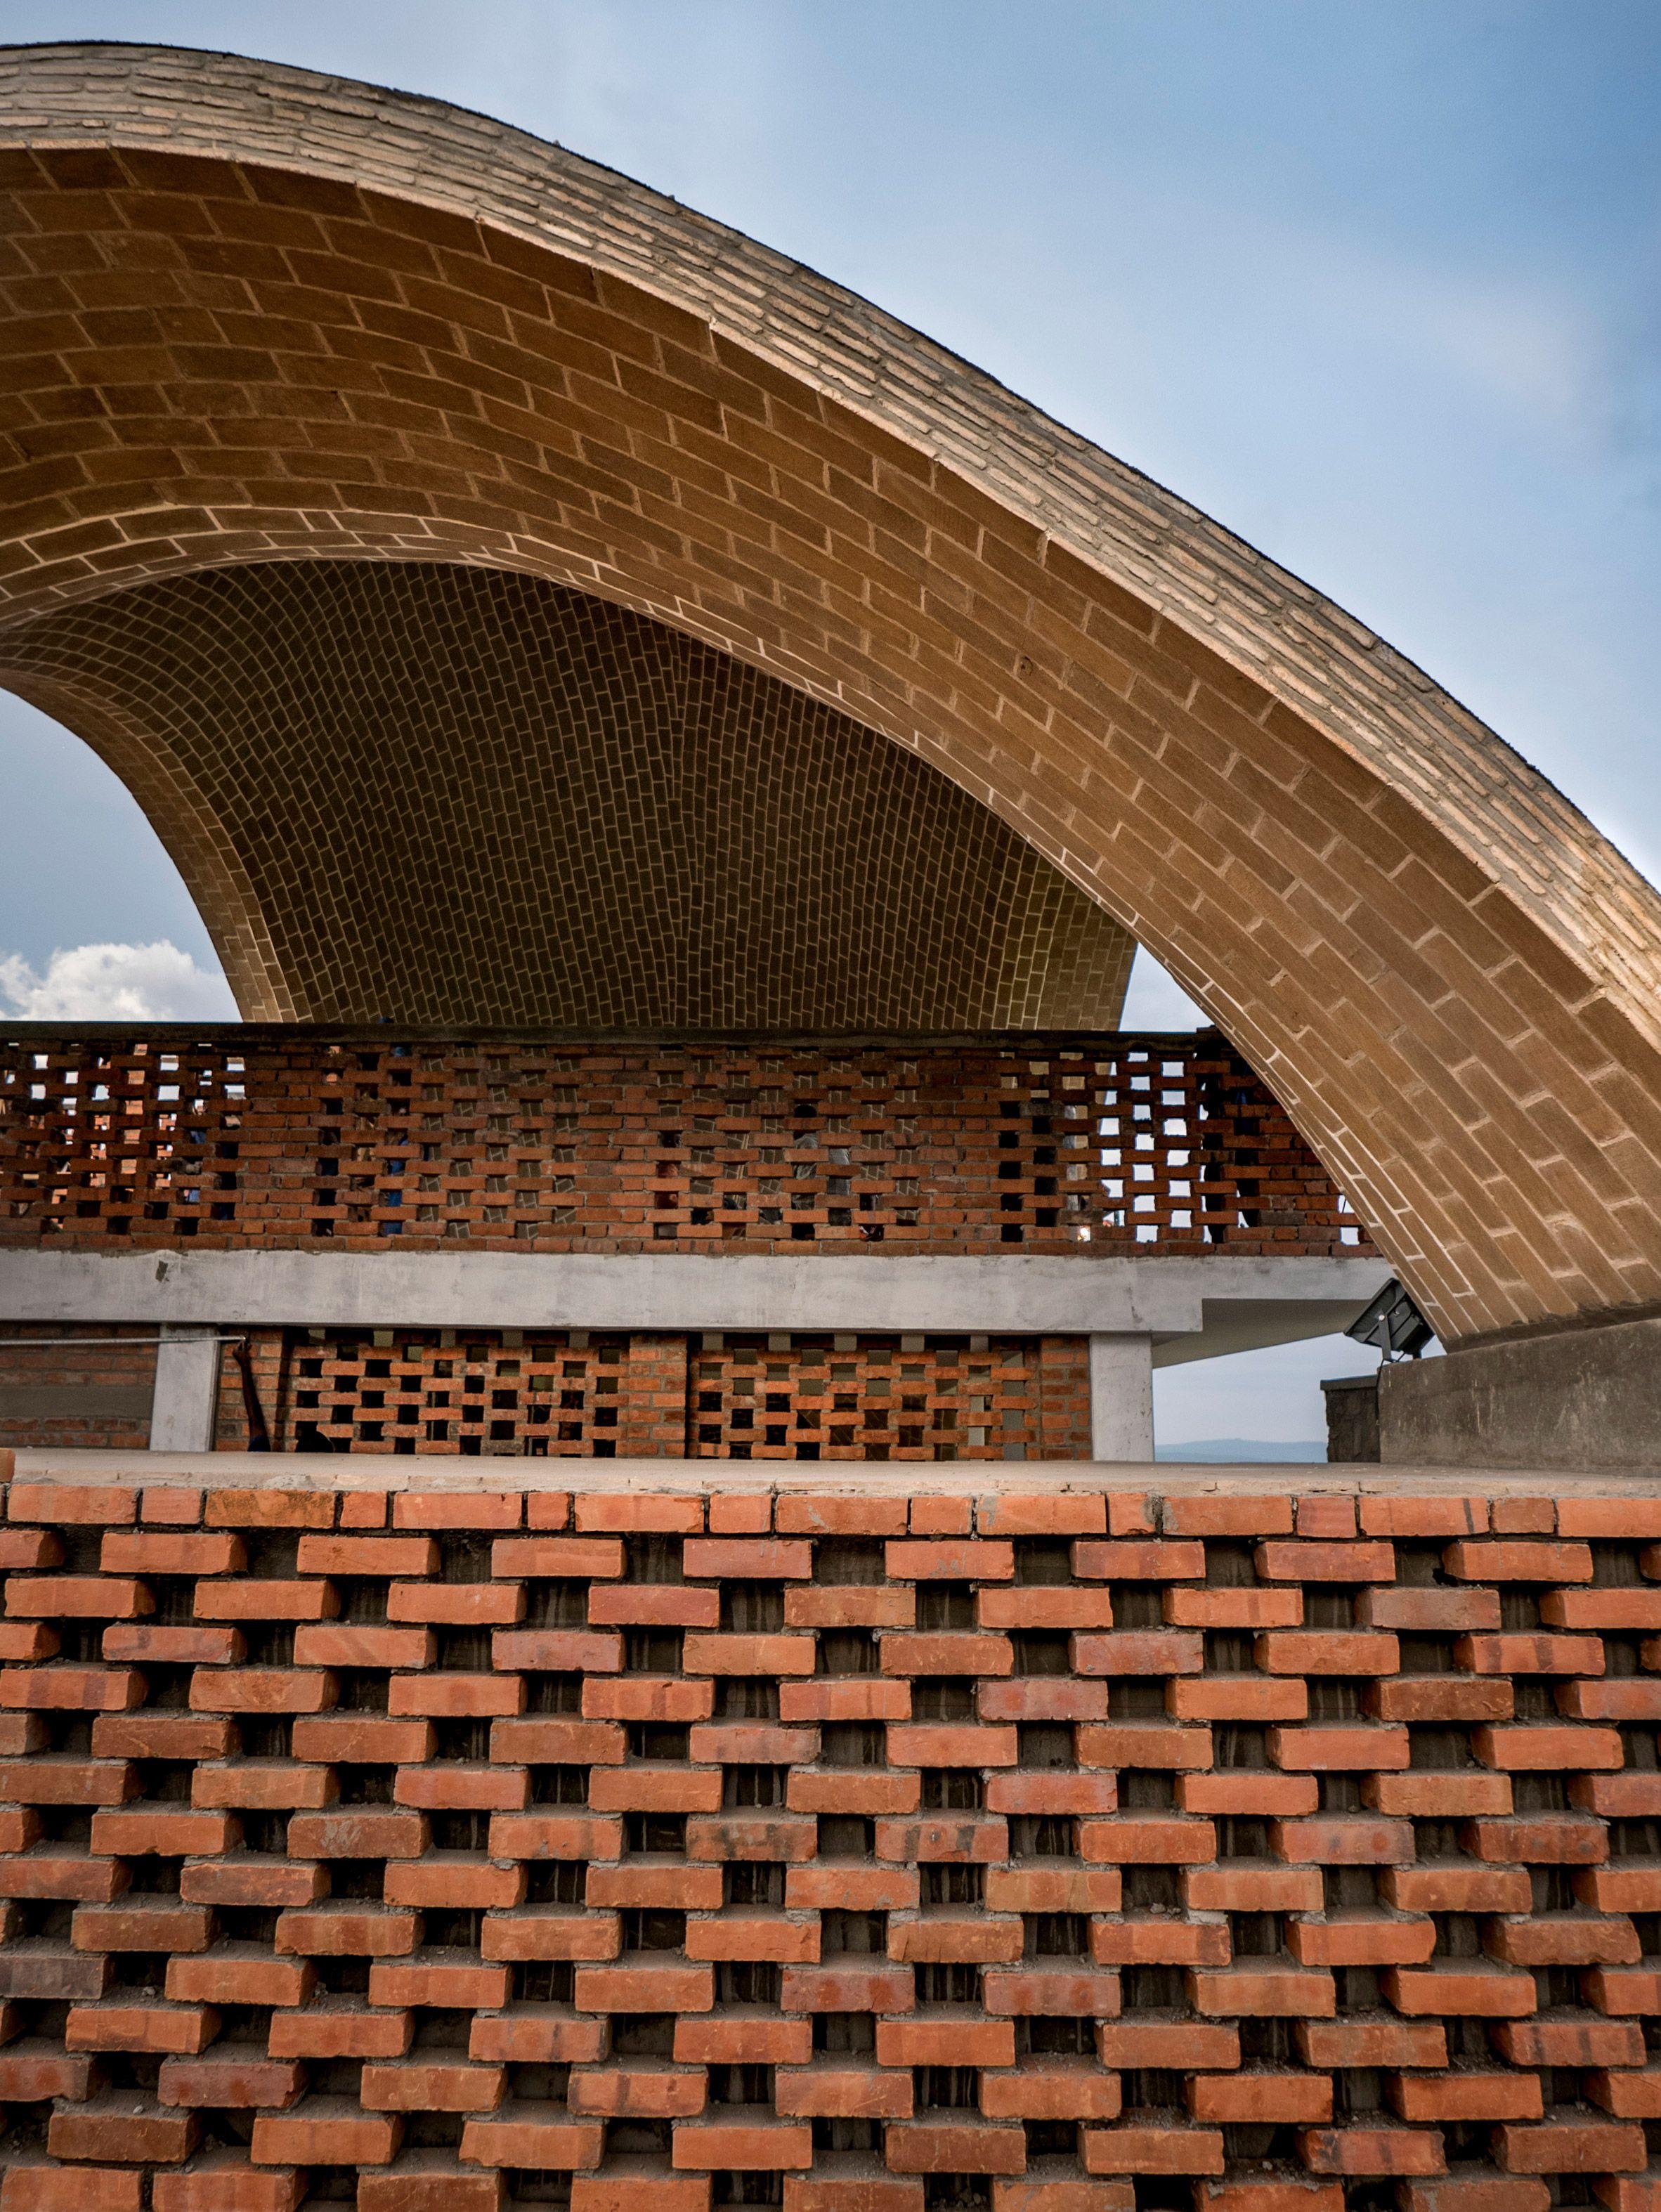 Rwanda Cricket Stadium By Light Earth Designs Earth Design Eco Architecture Stadium Lighting